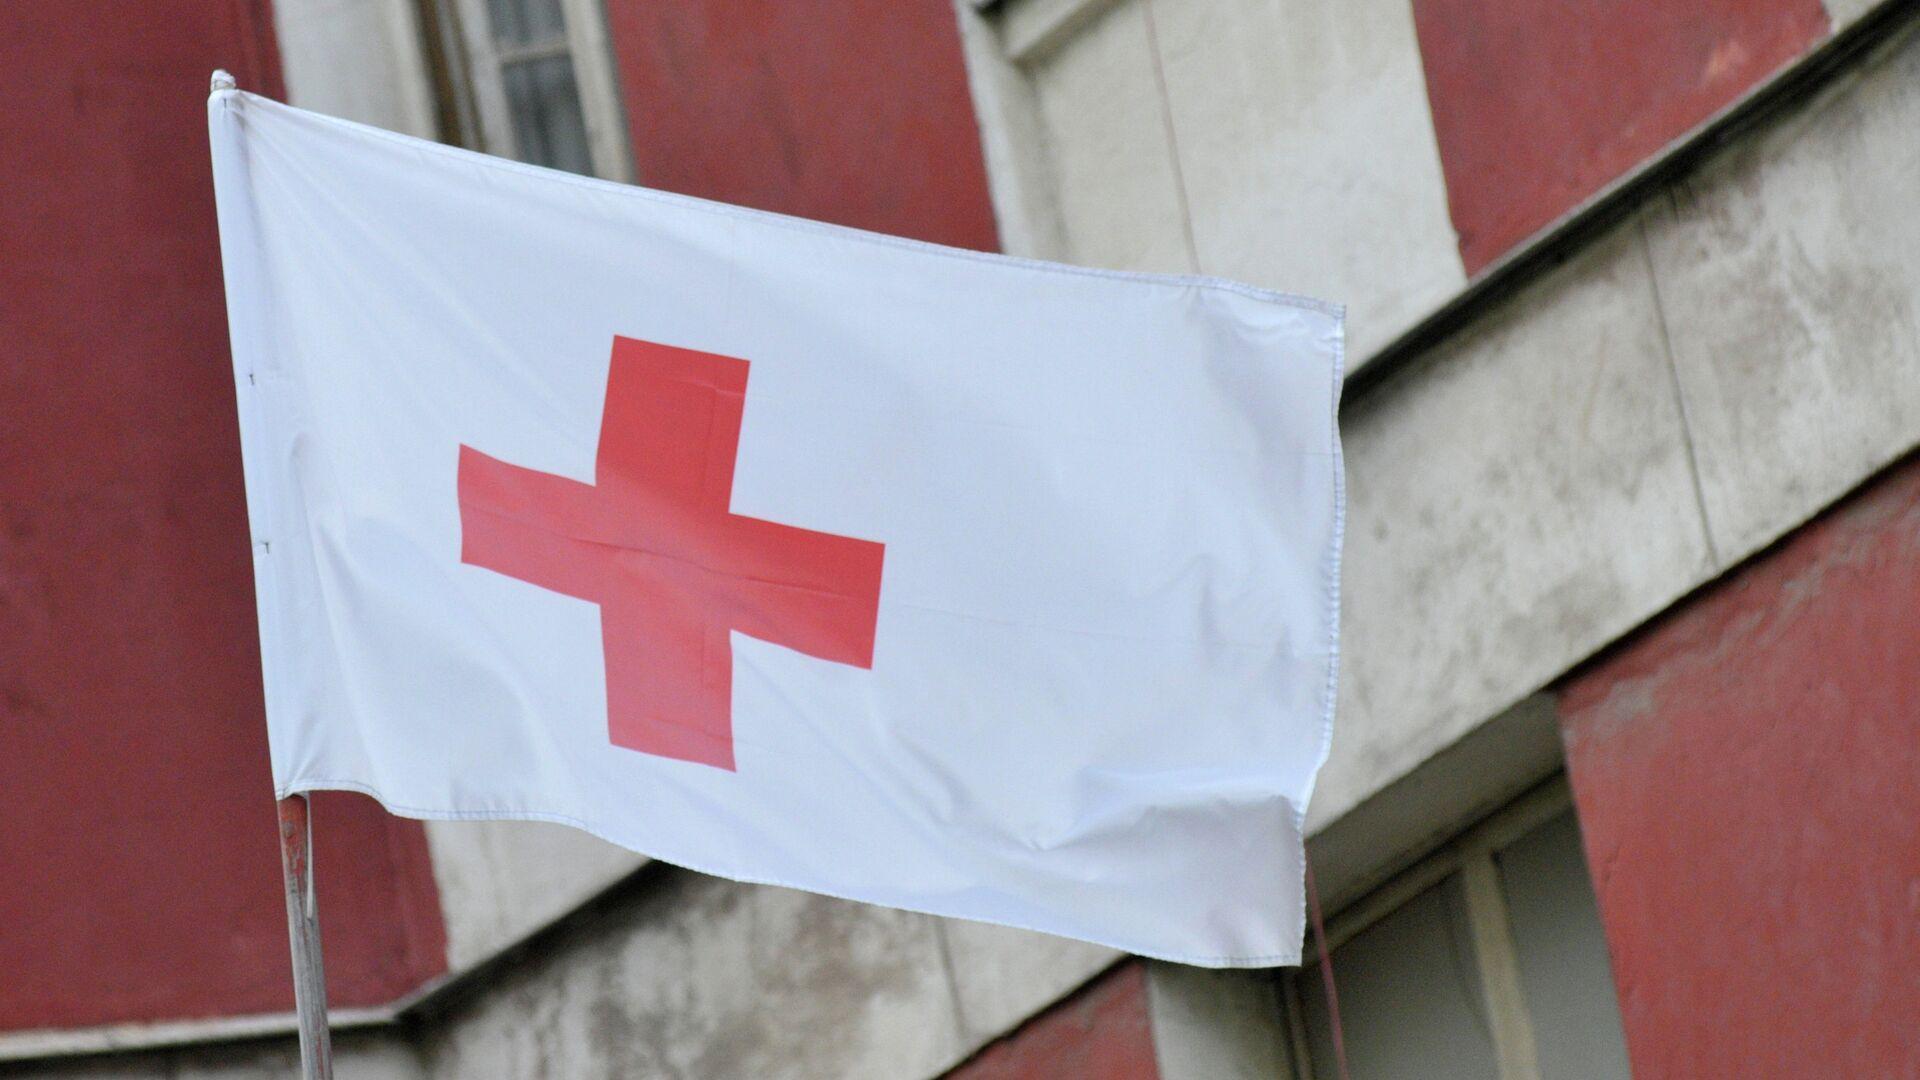 Cruz Roja - Sputnik Mundo, 1920, 14.06.2021